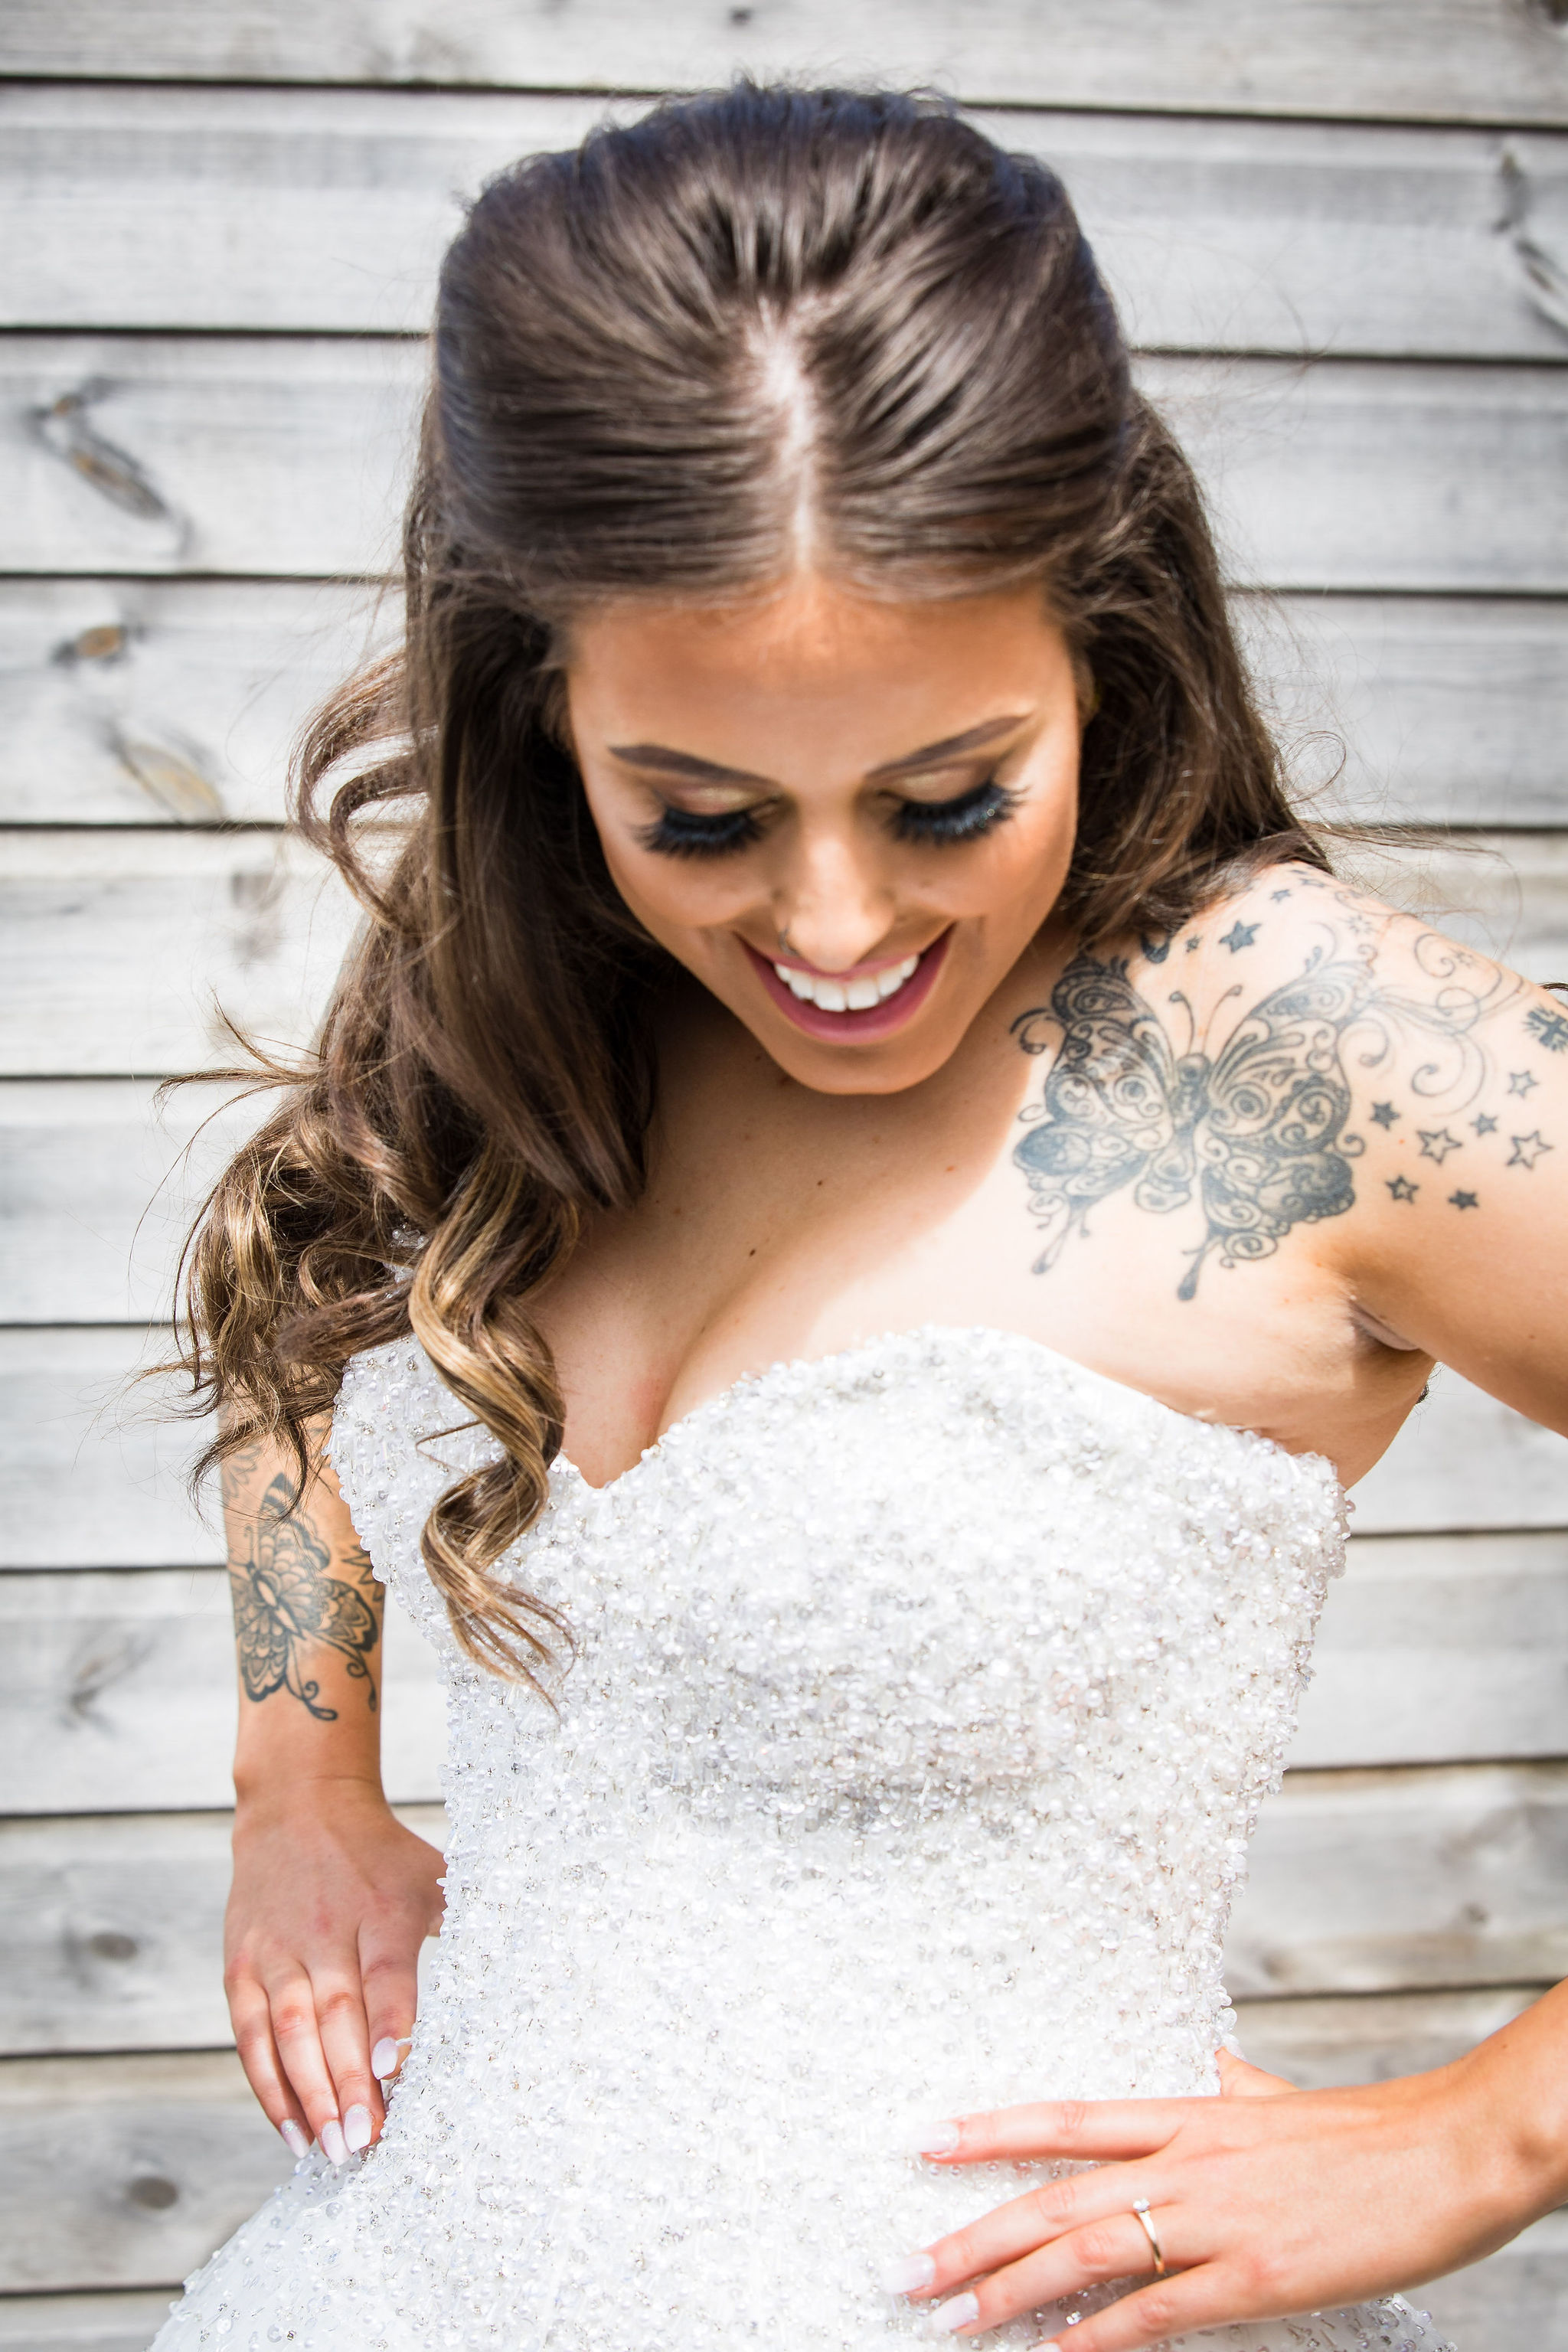 Harriet&Rhys Wedding - Magical sunflower wedding - quirky wedding with dodgems (32)